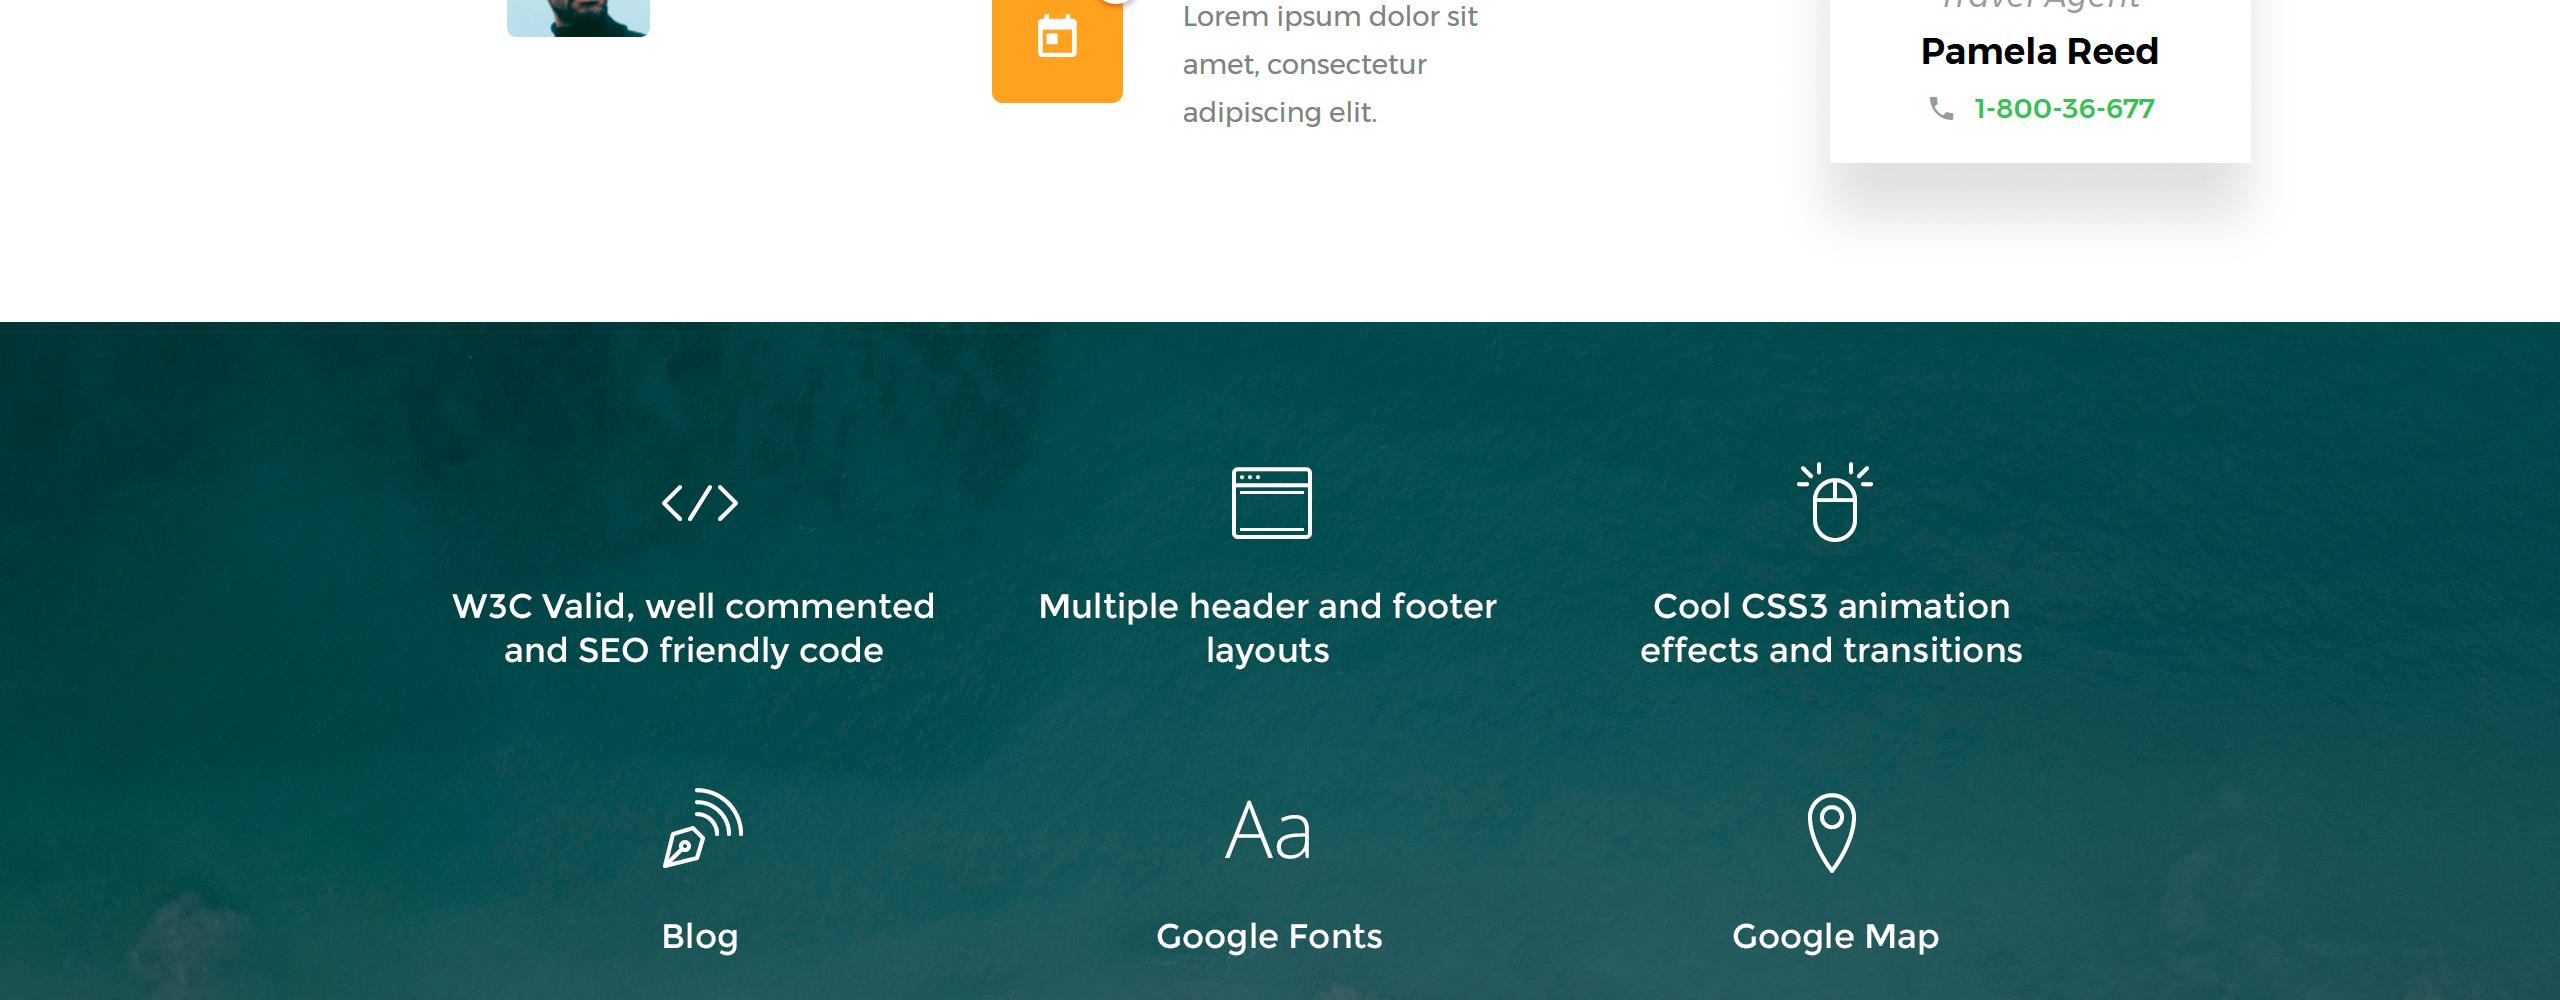 Sunway Website Template